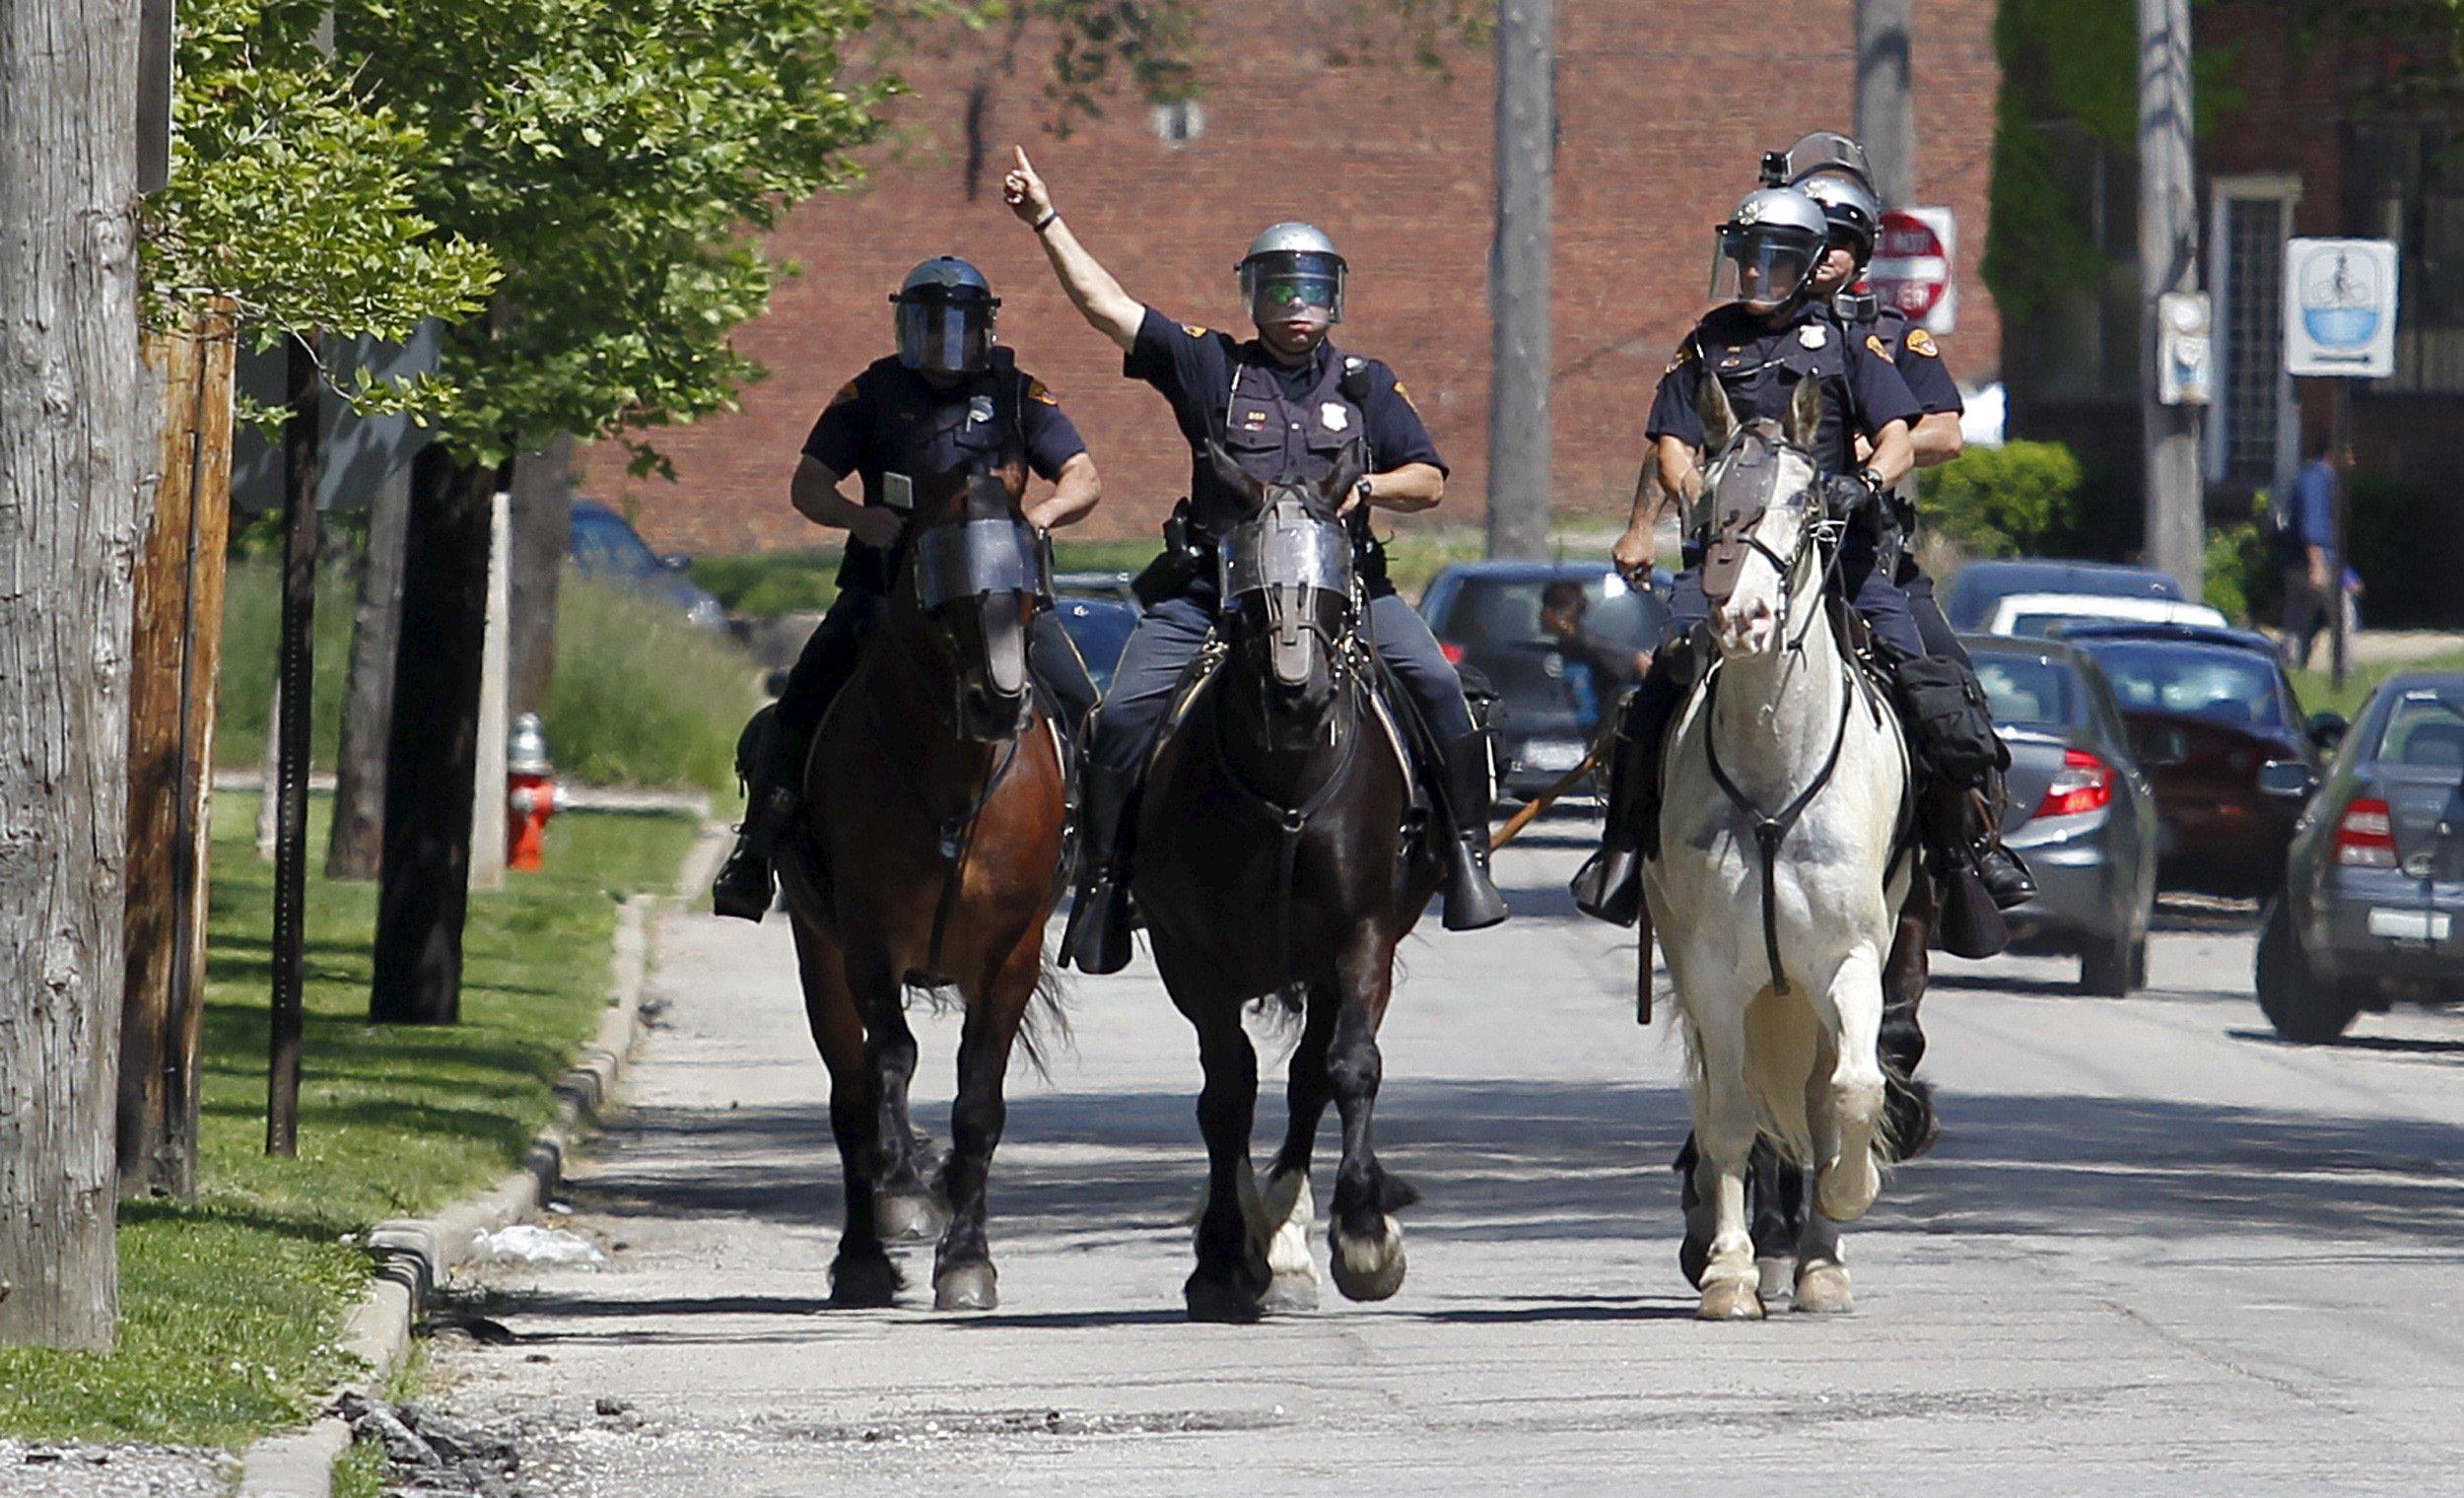 04_08_Cleveland_Cops_01